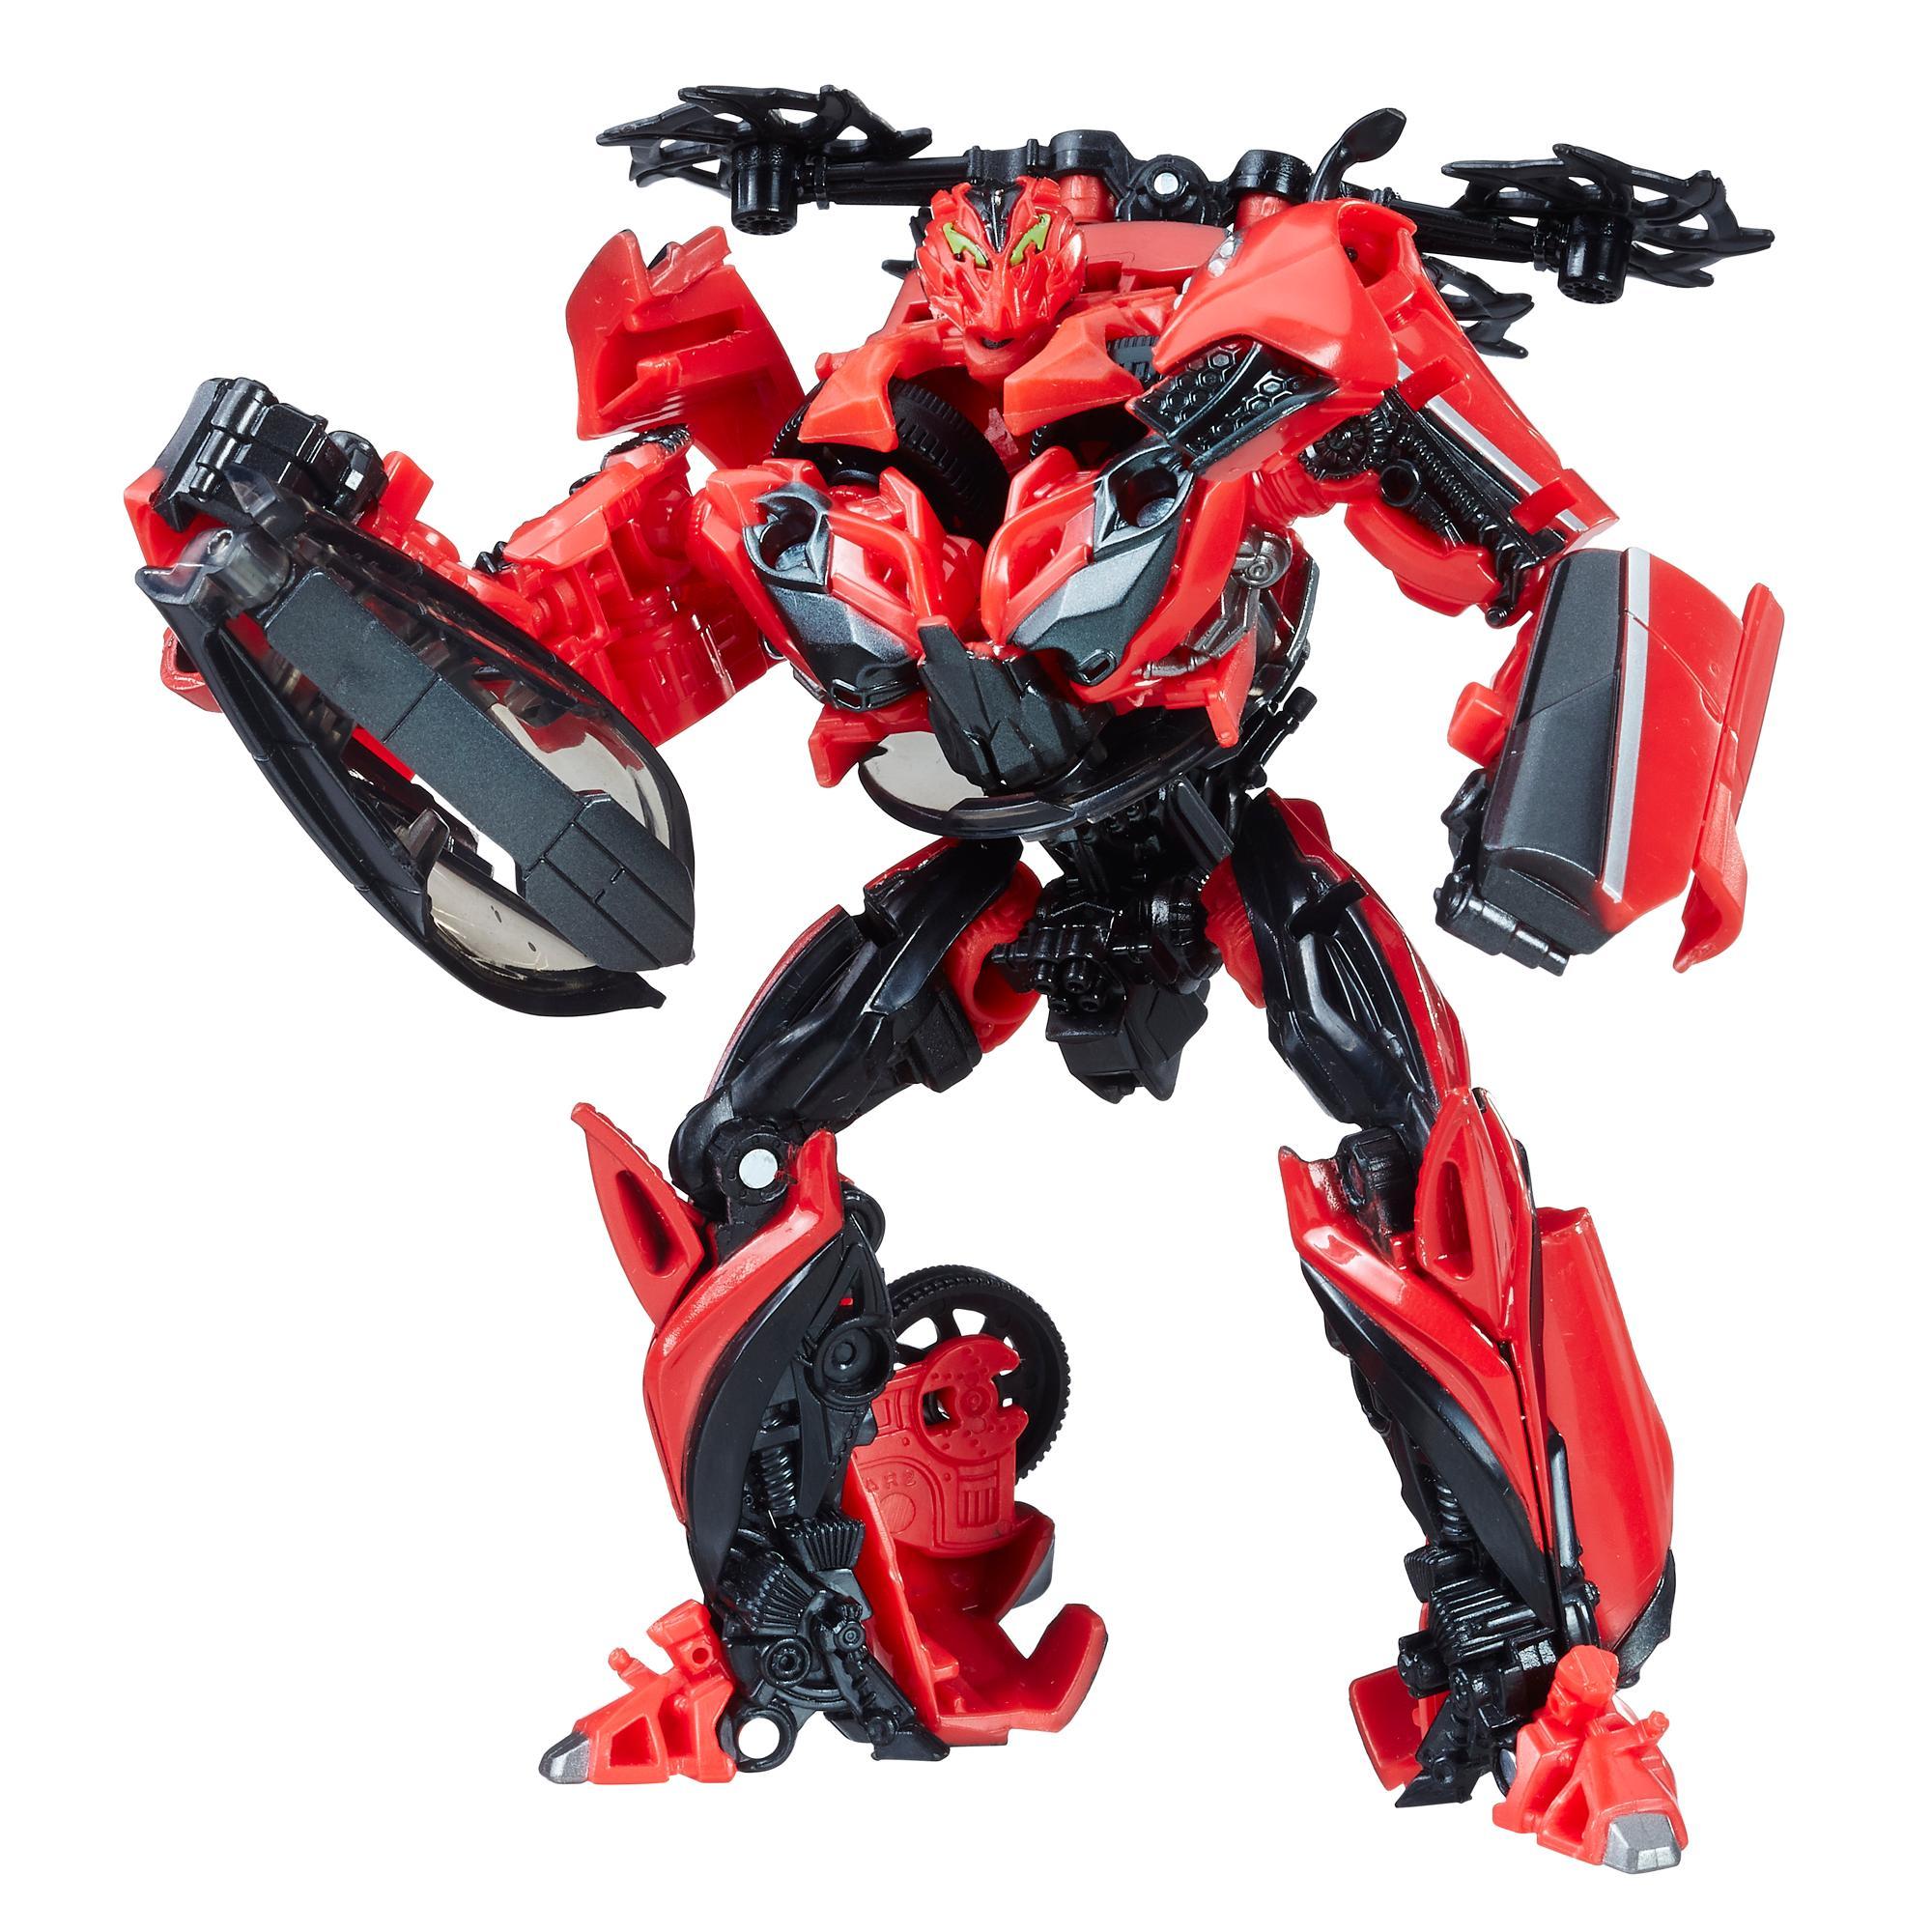 Transformers Filmleri Serisi Figür - Stinger